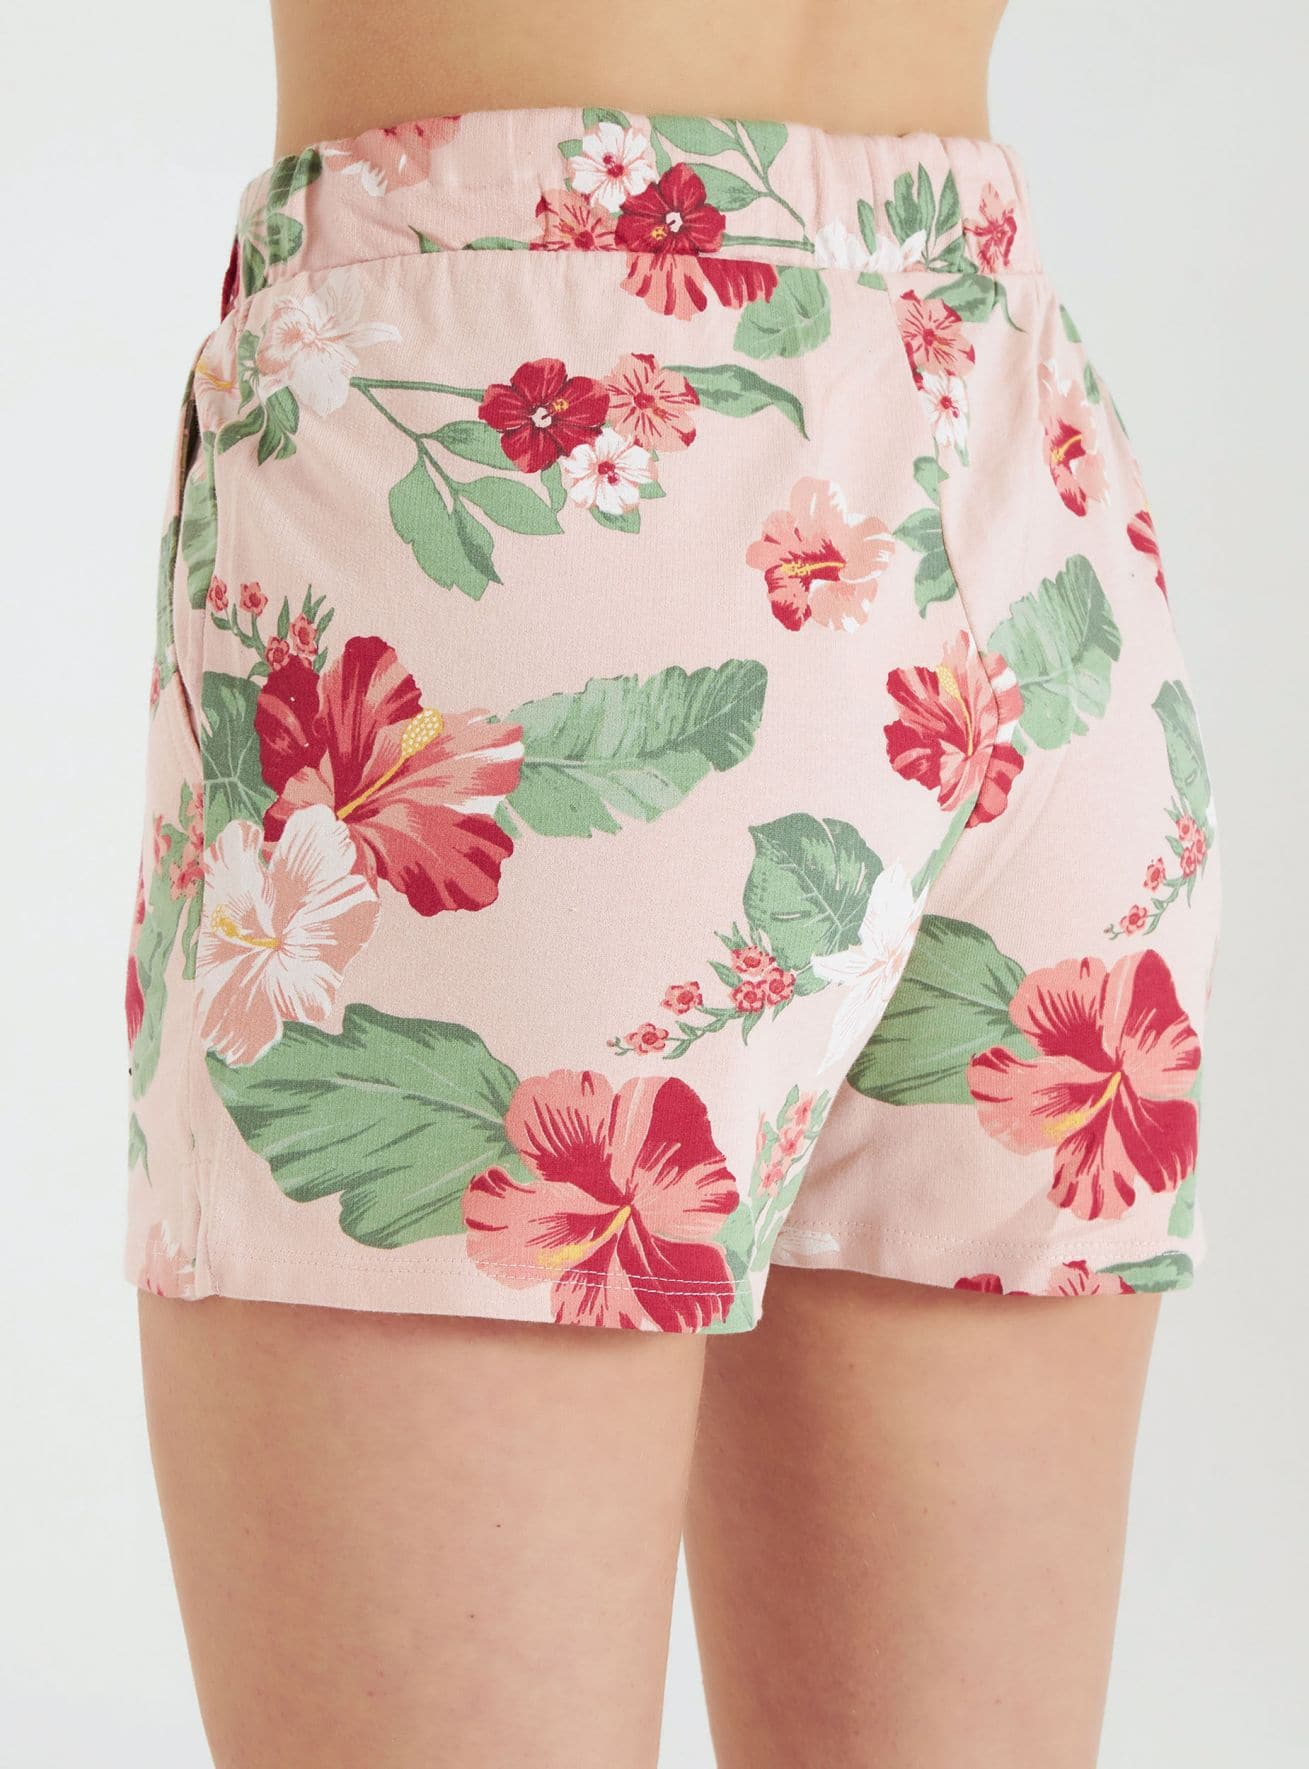 Pantalone ginnico Corto Donna Terranova